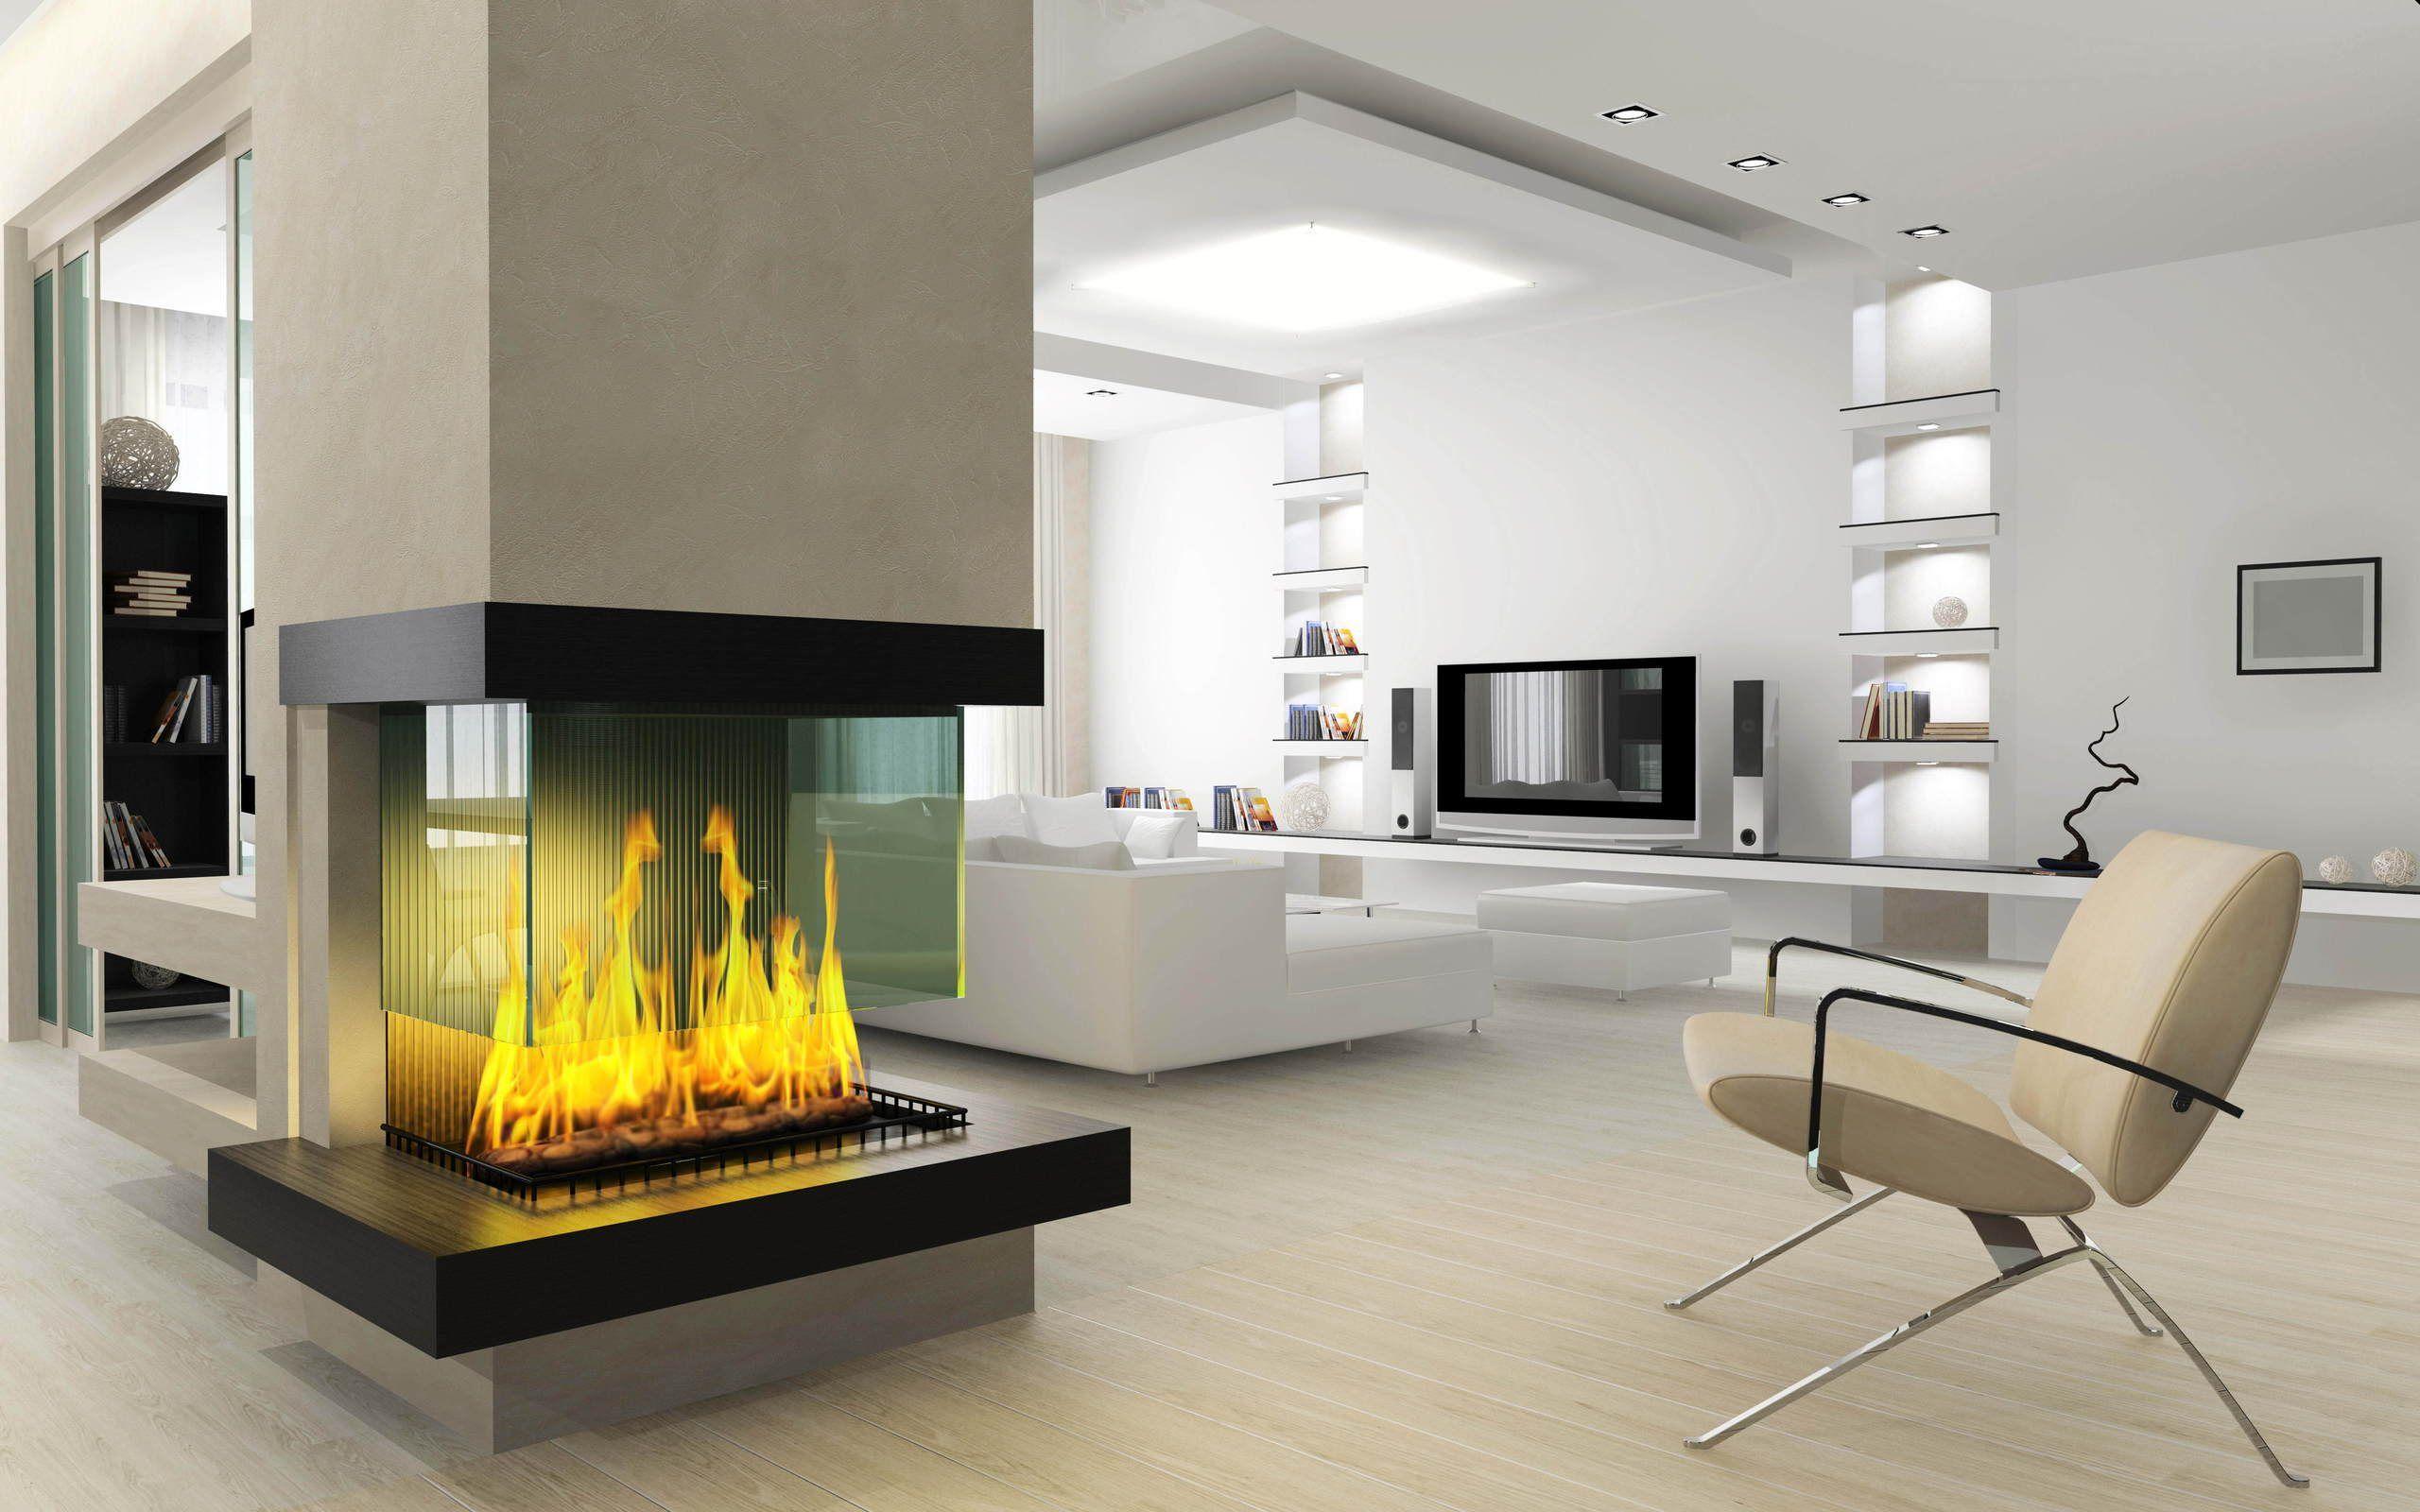 Moderna-Extreme; interiors designs | Fireplaces | Pinterest ...